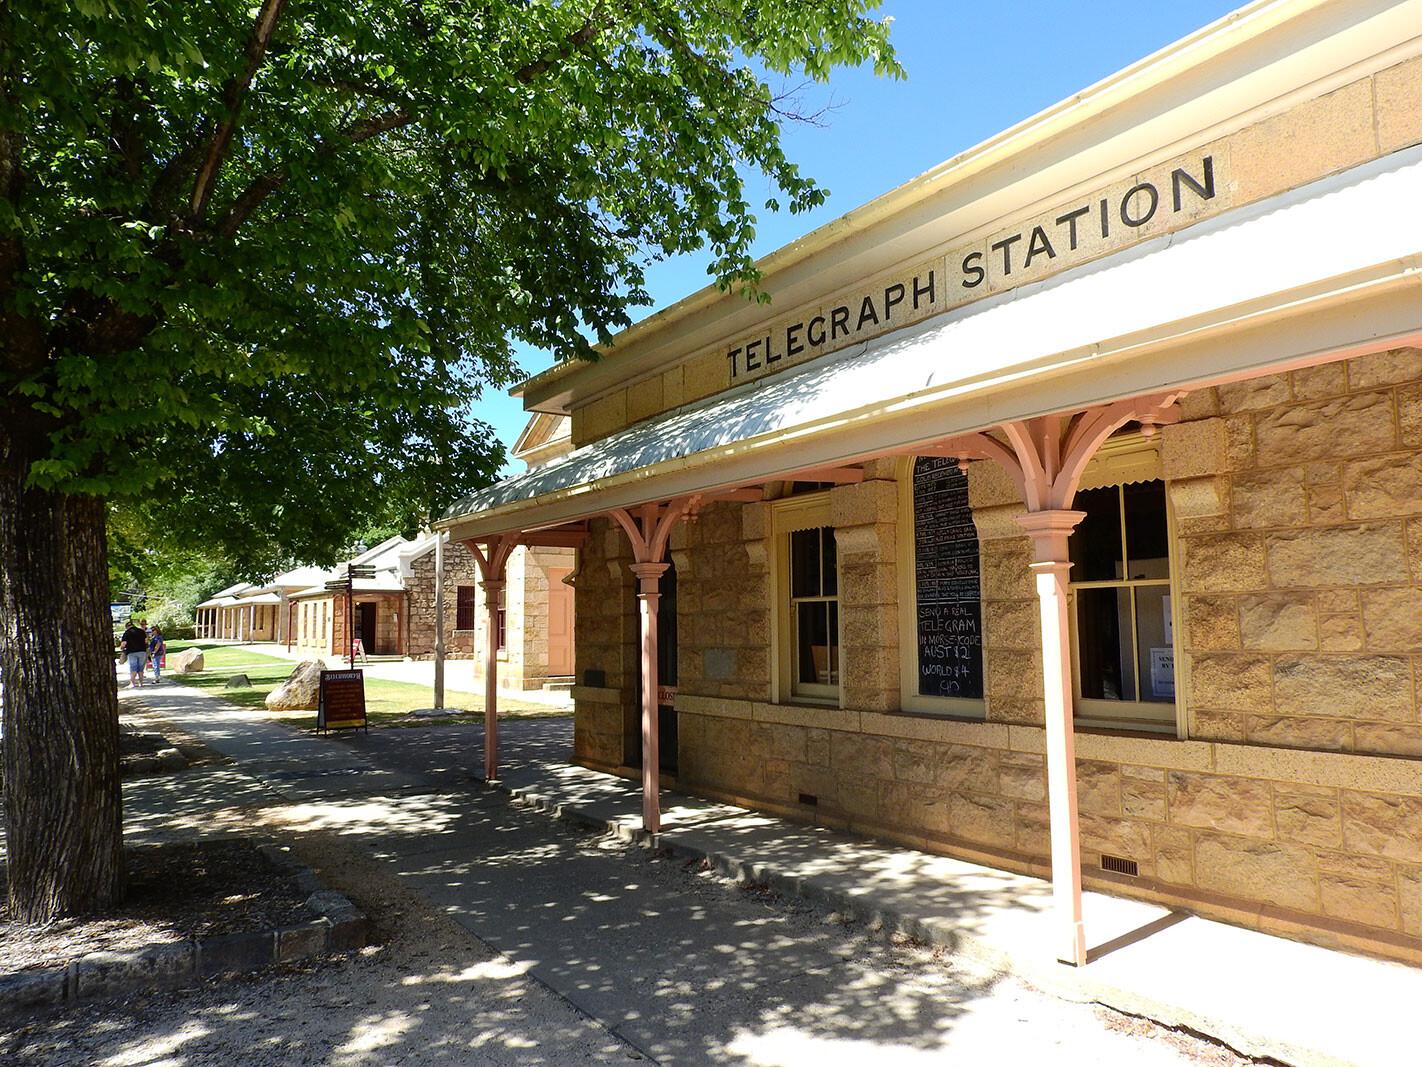 Historic Telegraph Station - Beechworth